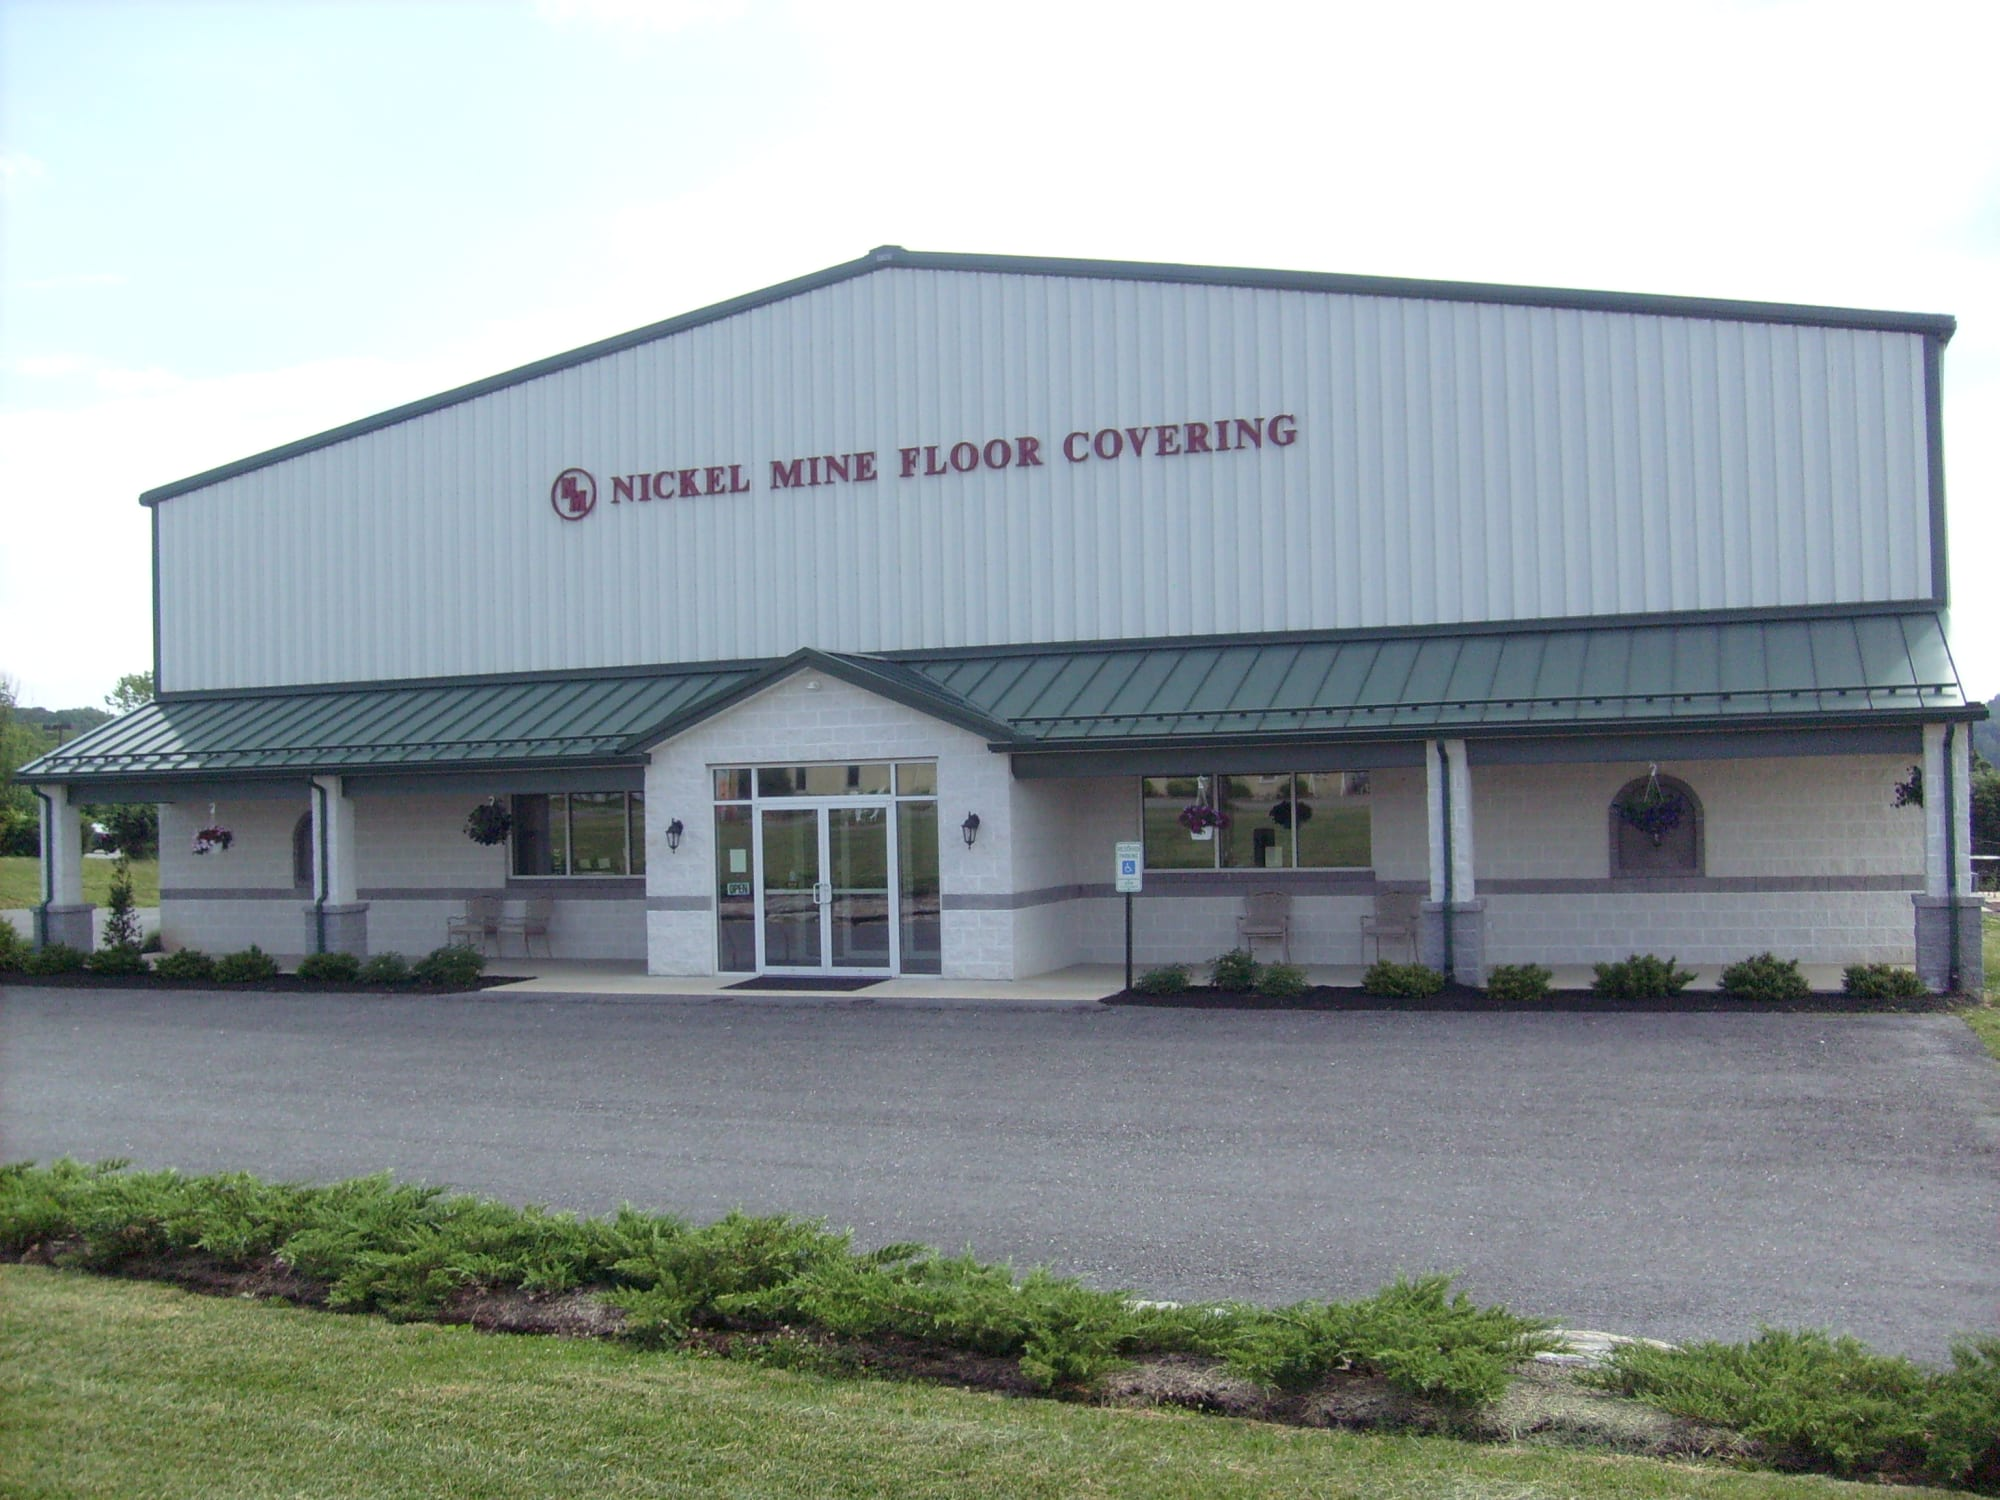 Nickel Mine Floor Covering Inc - 359 Buck Rd Quarryville, PA 17566